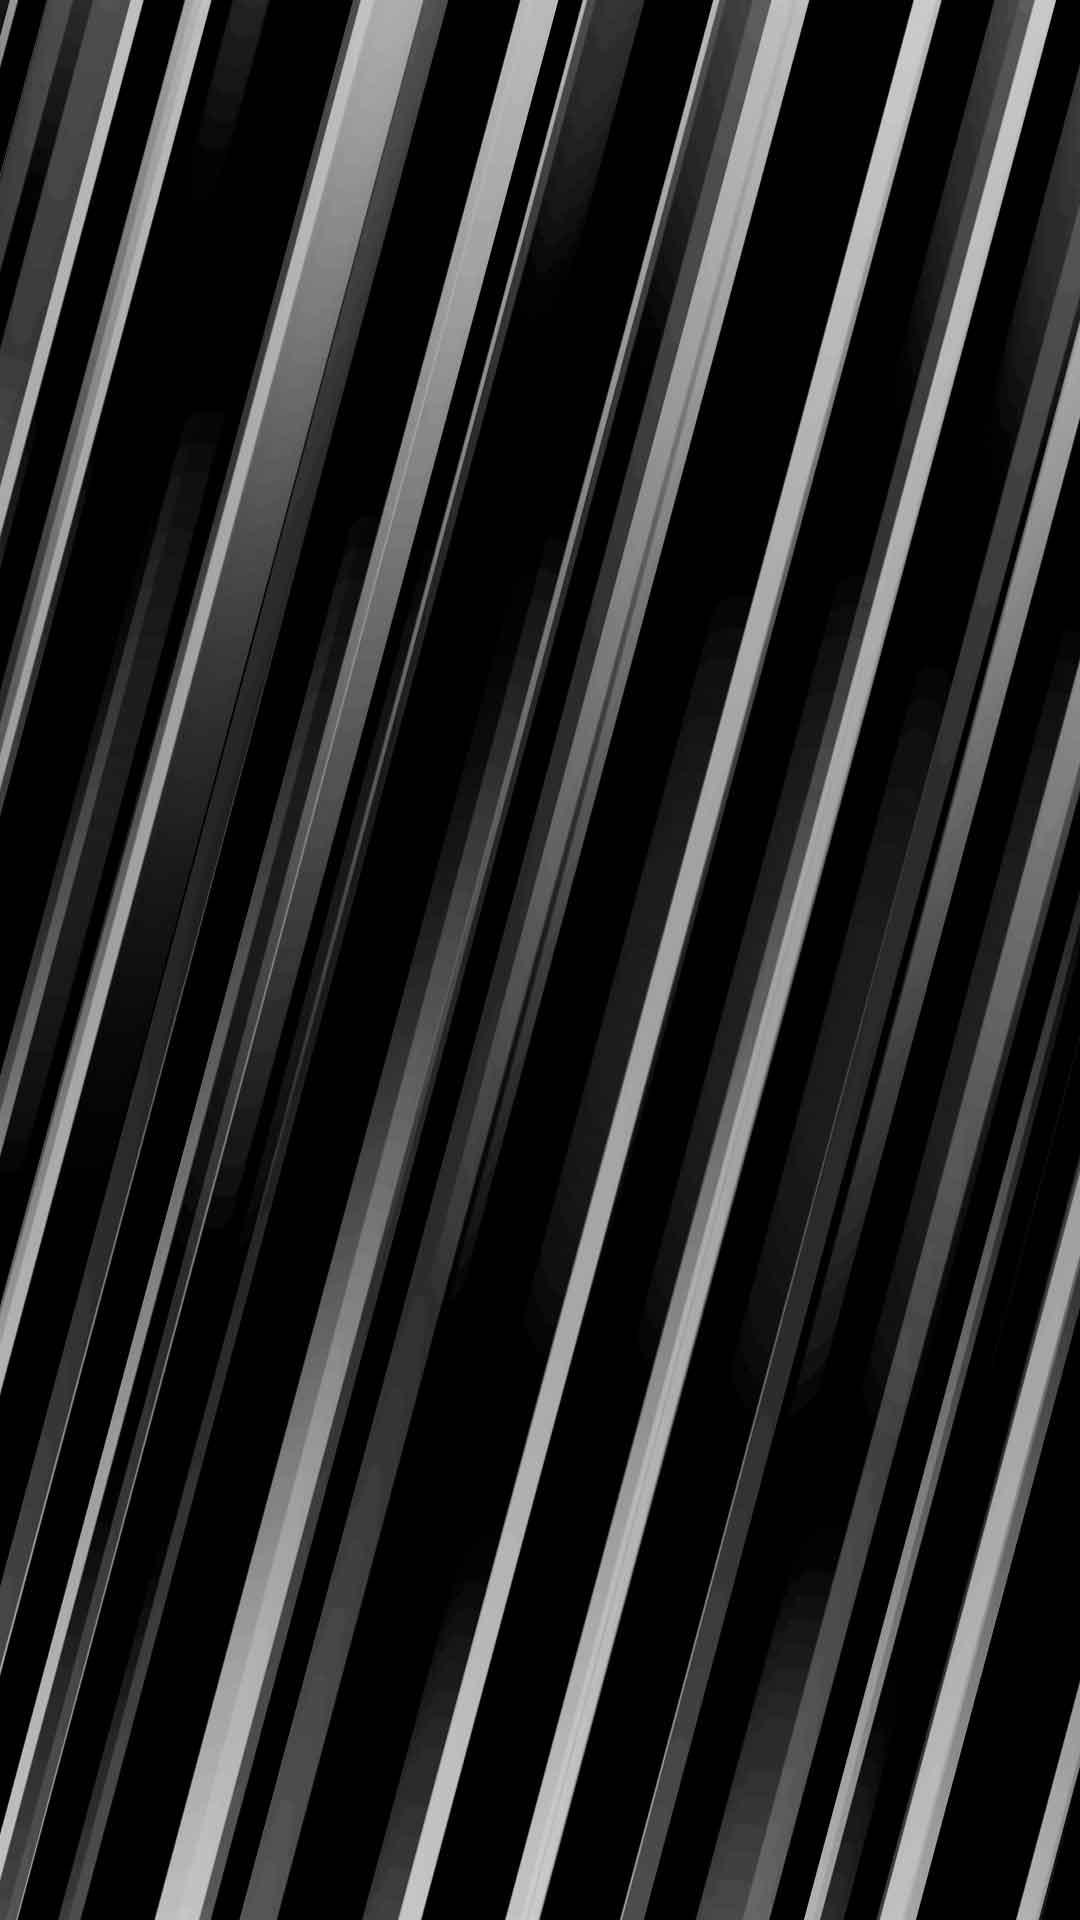 black and white wallpaper hd